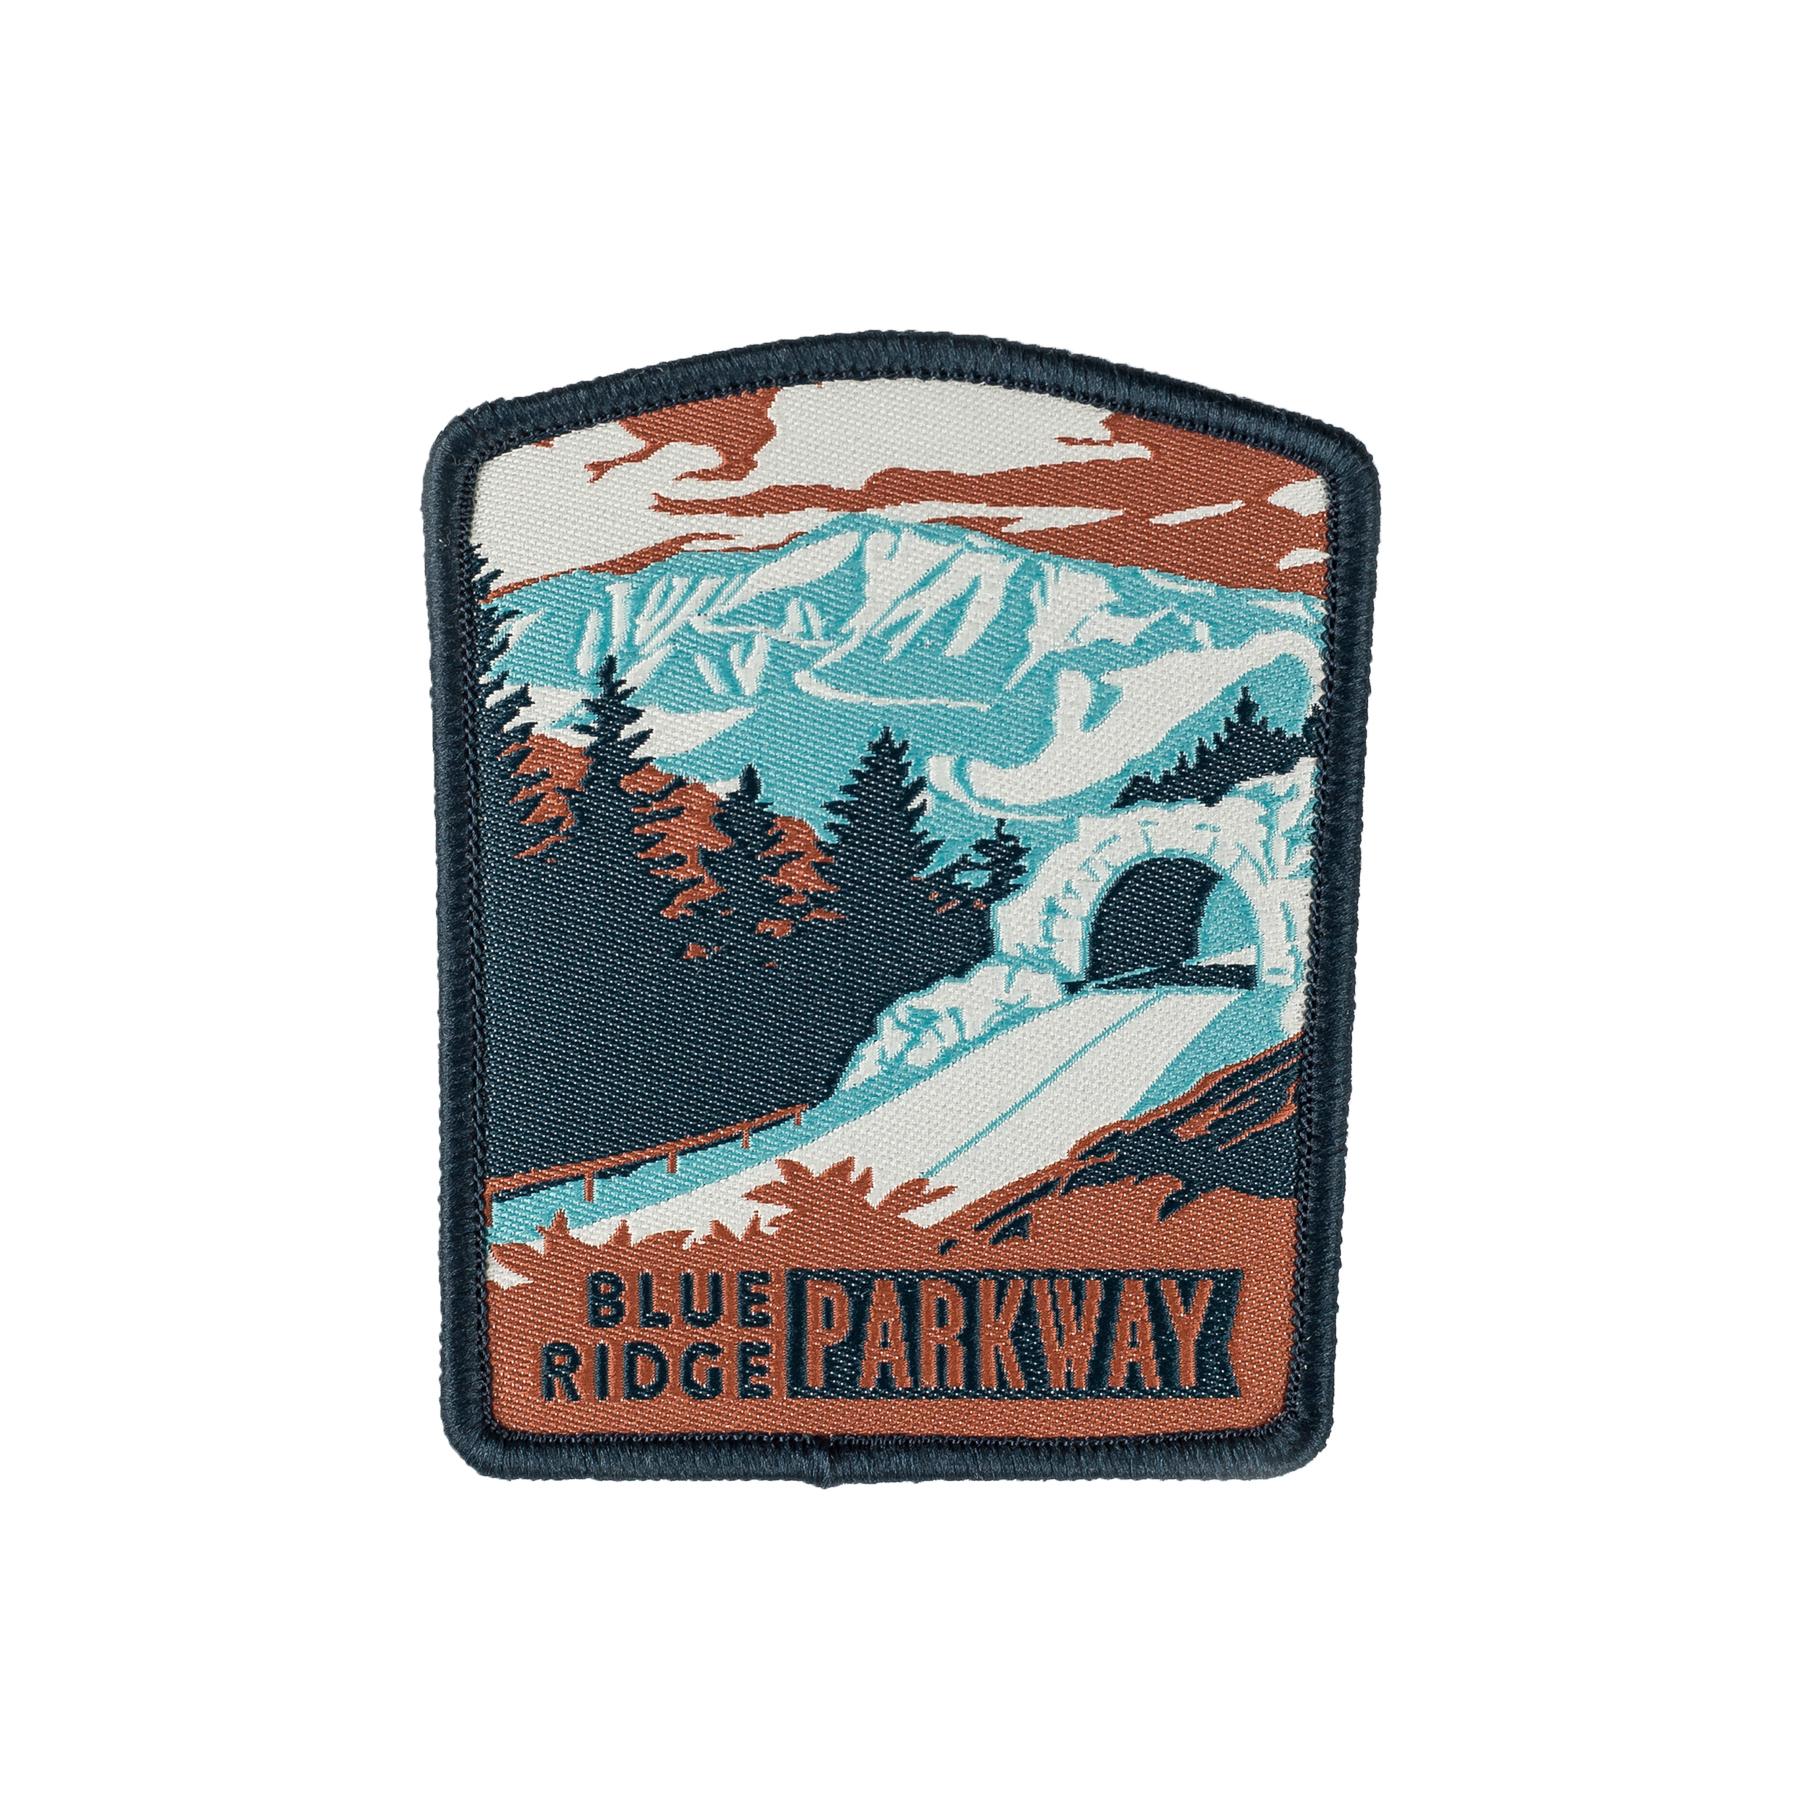 blue-ridge-parkway-patch.jpg